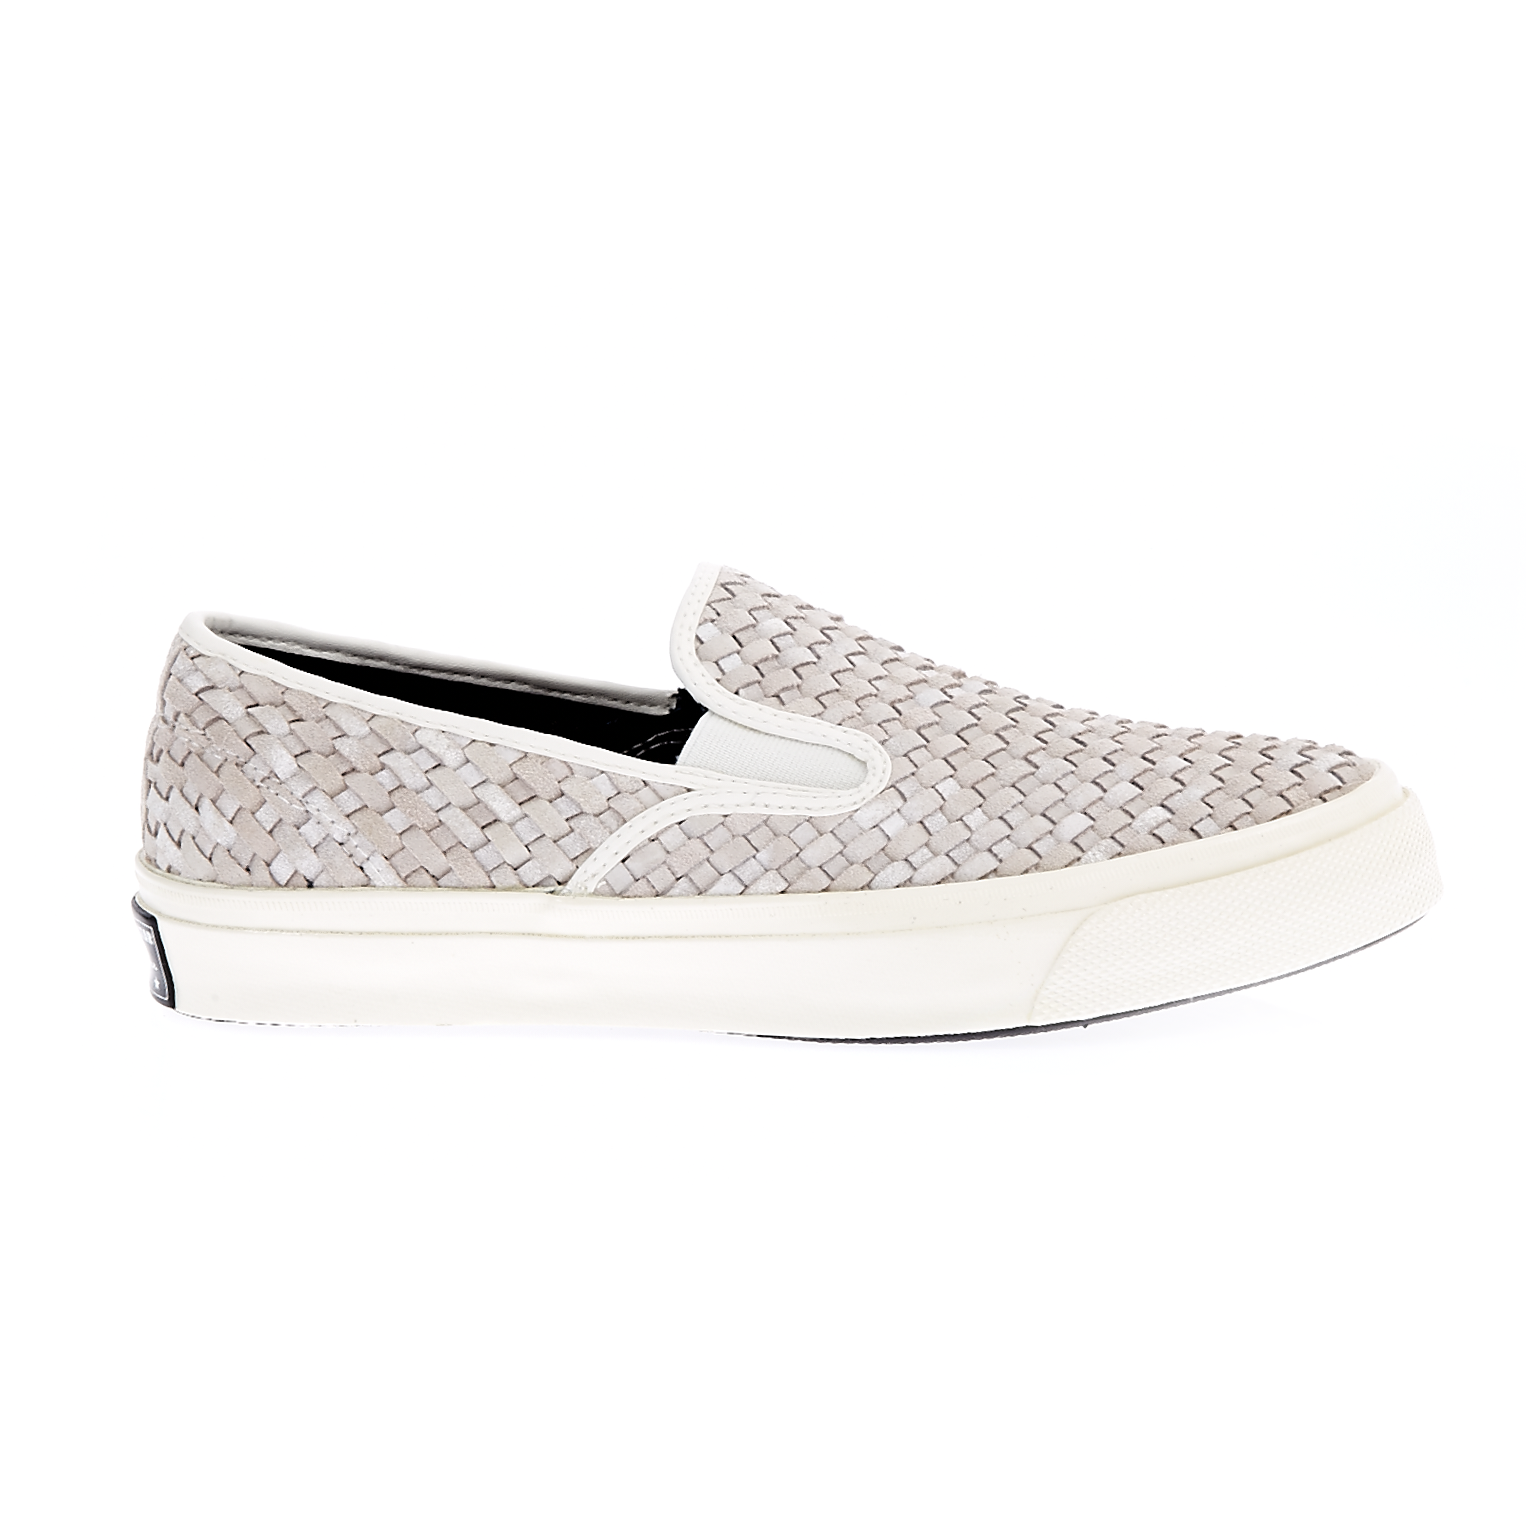 CONVERSE – Unisex παπούτσια Deck Star Slip μπεζ